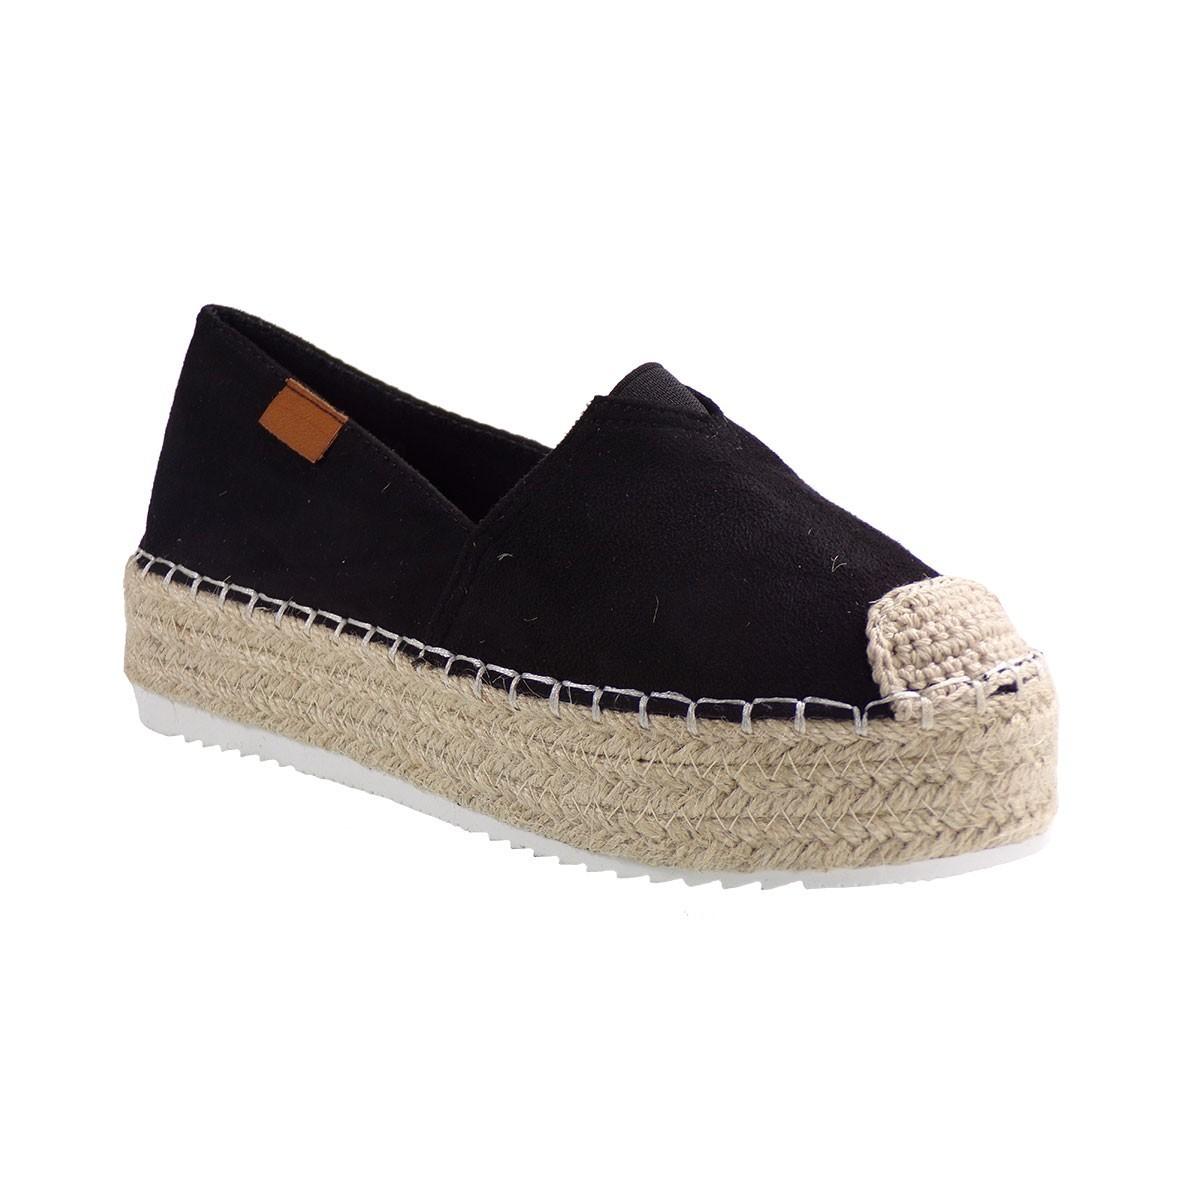 Bagiota shoes Εσπαντρίγιες Γυναικείες A8695 Mαύρο